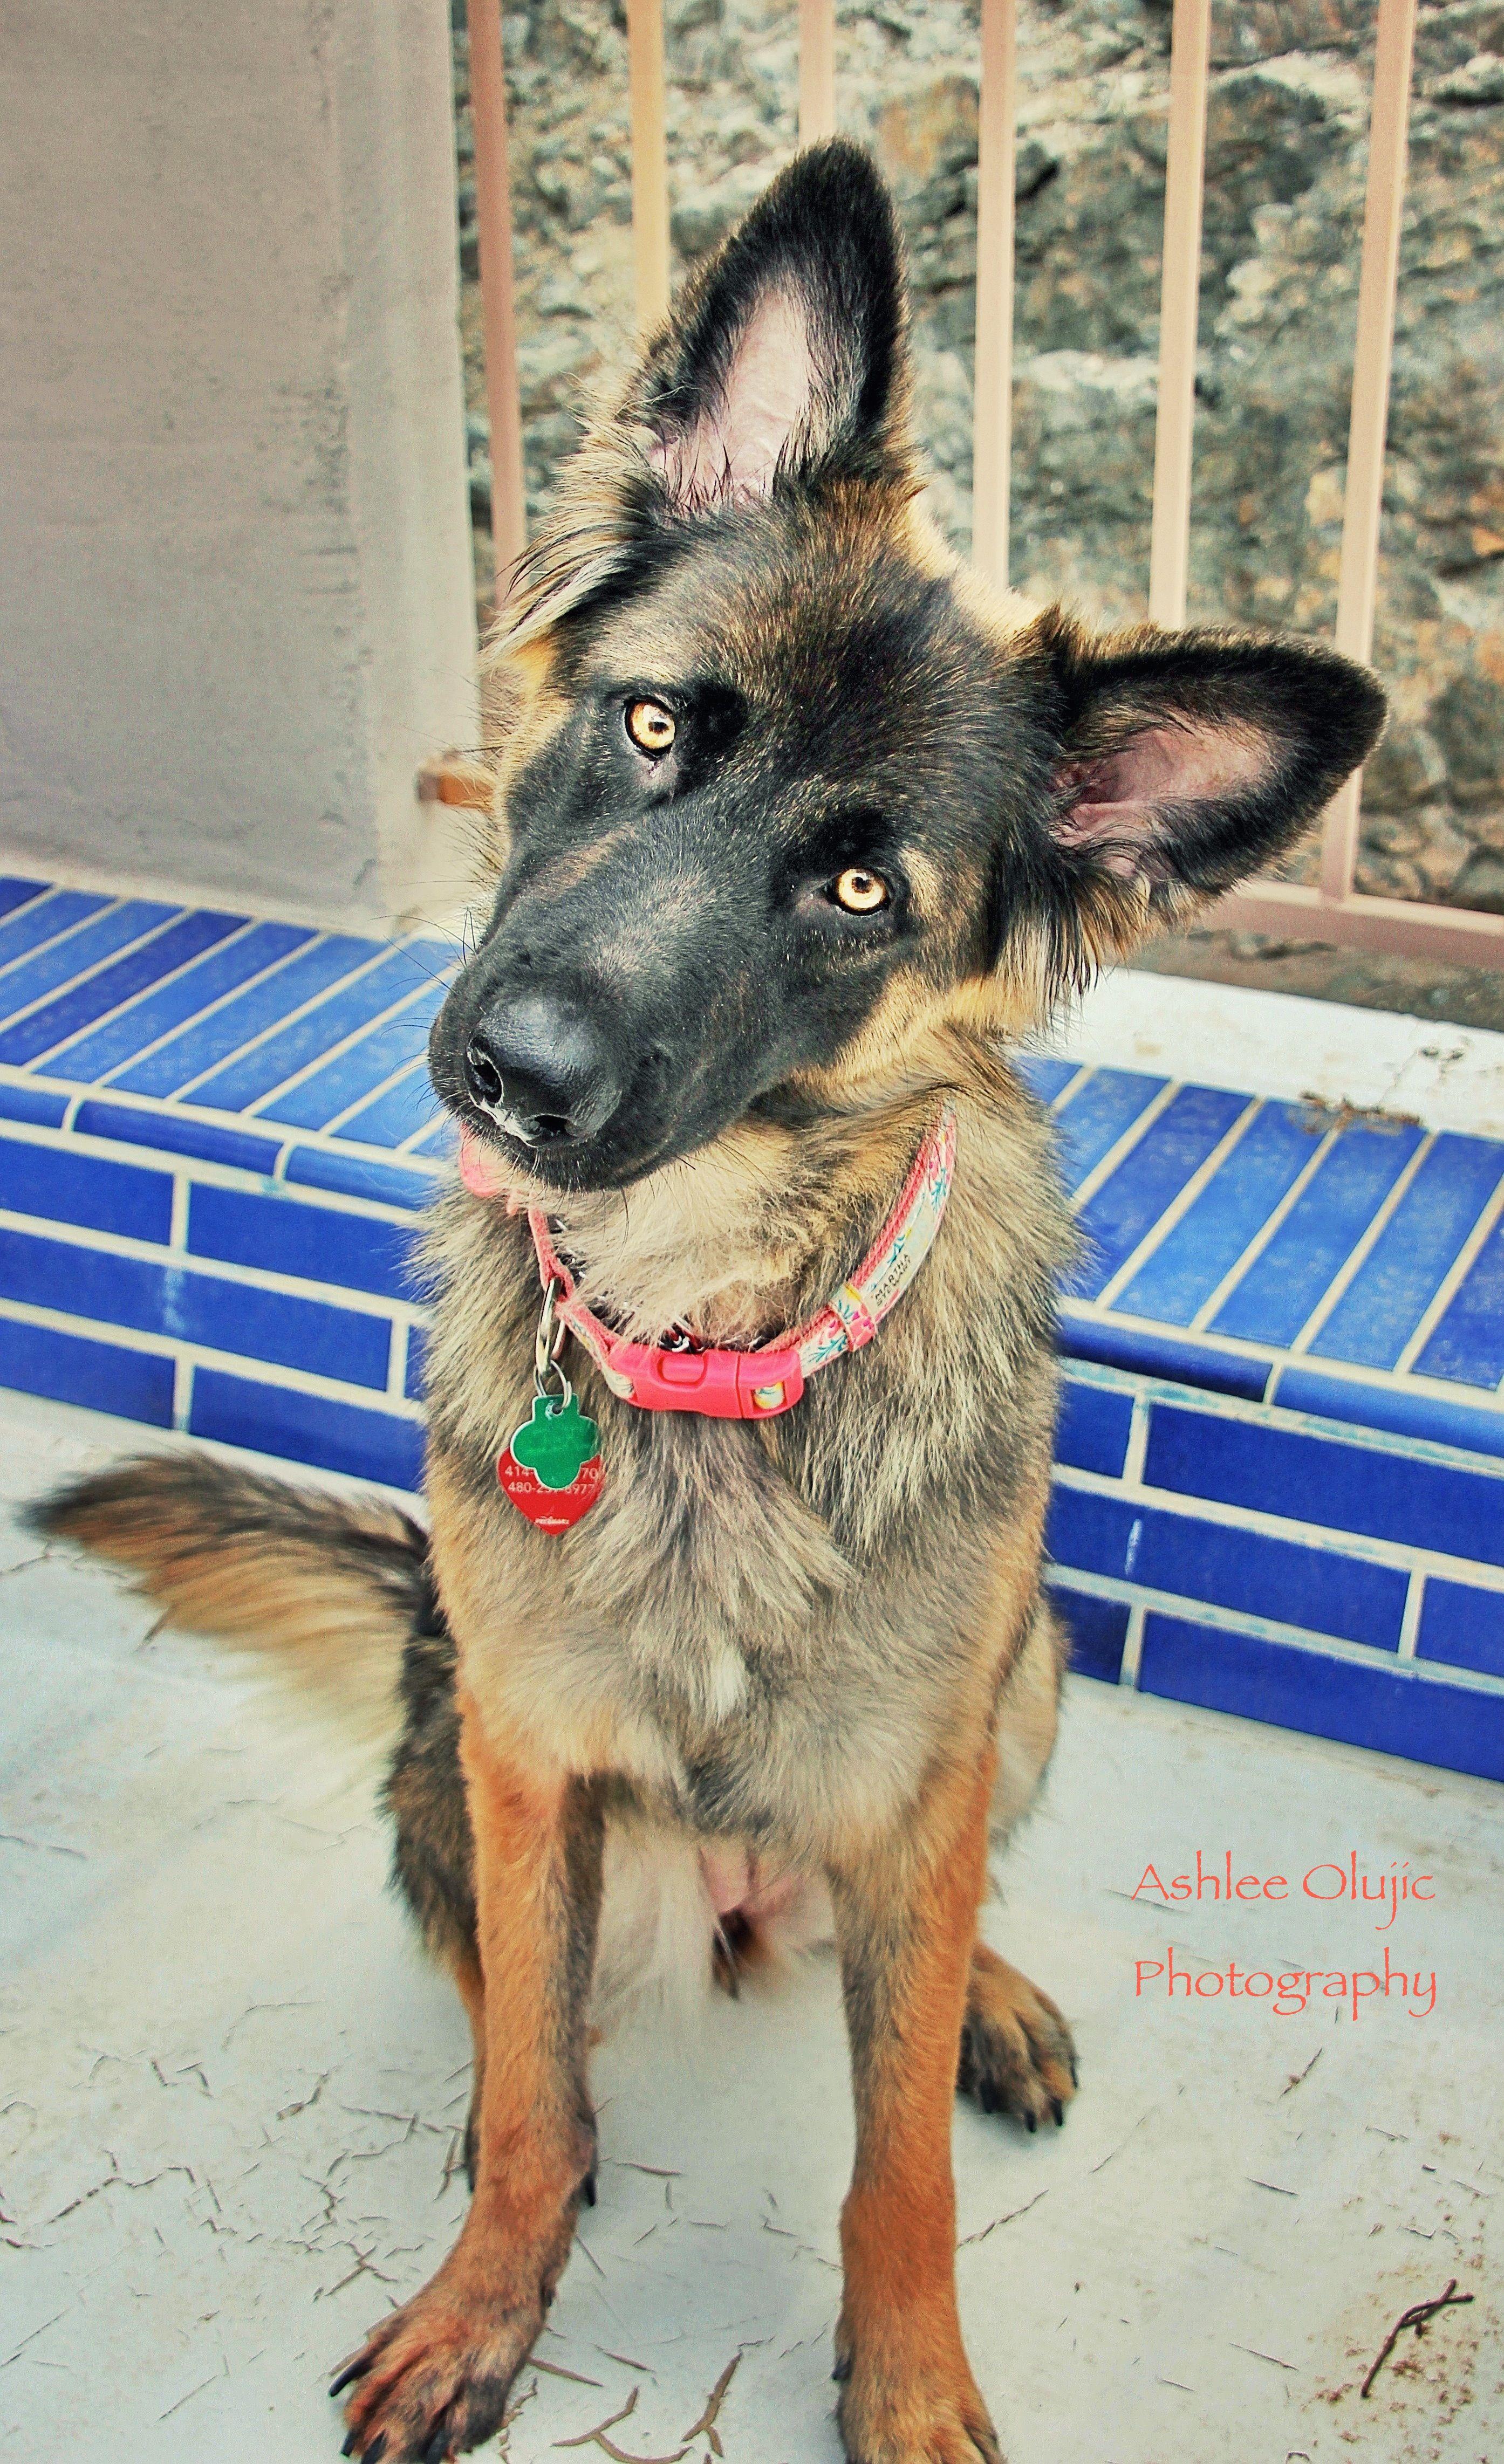 Malinois Belgian Shiloh Shepherd Gorgeous Smart And Beautiful Breed Dog Mixes Shiloh Shepherd Cute Animals